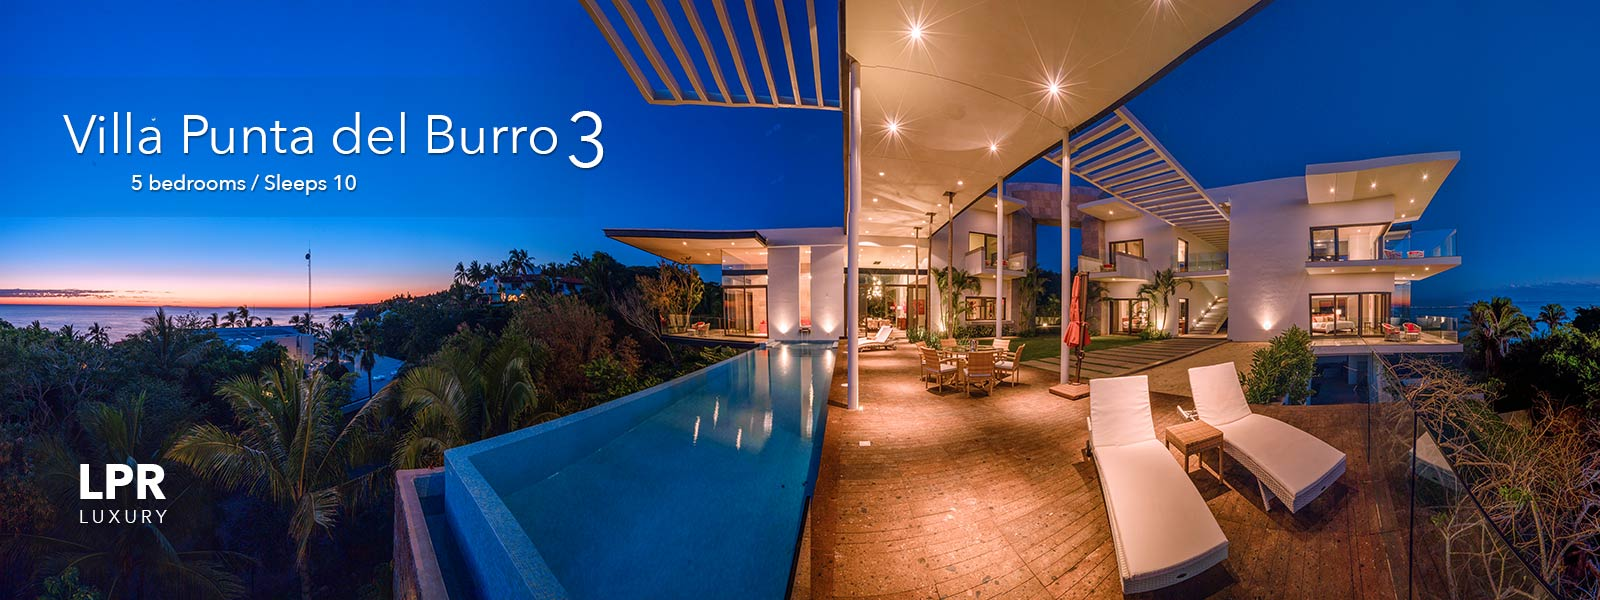 Villa Punta del Burro 3 - Luxury Punta de Mita Real Estate - Punta del Burro